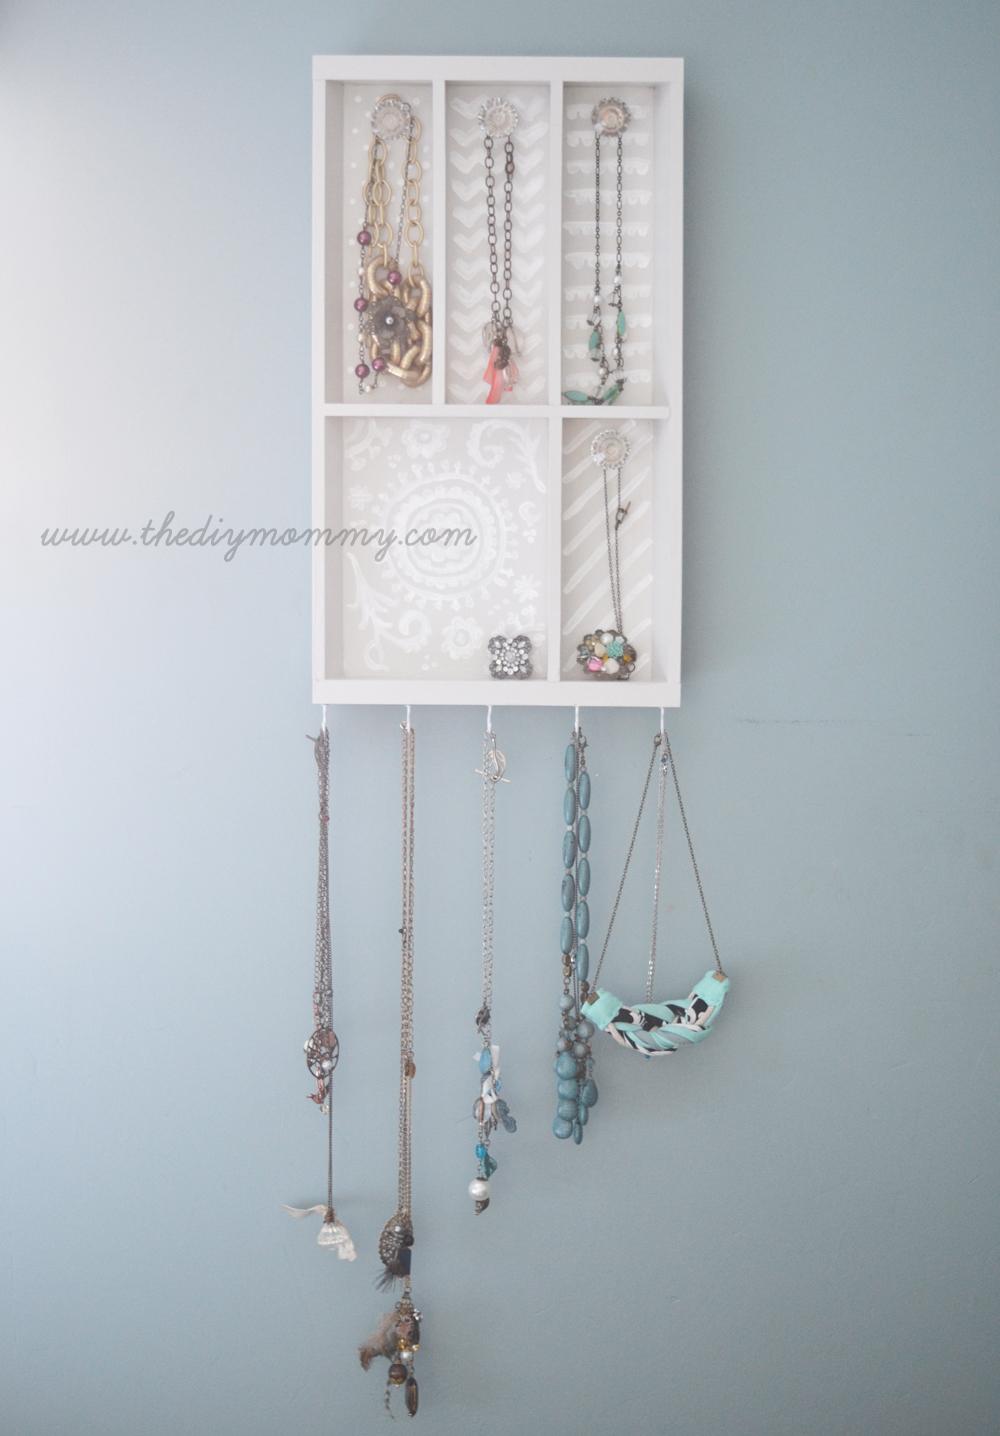 Pretty Jewelry Holder from Wooden Cutlery Tray - IKEA Hackers